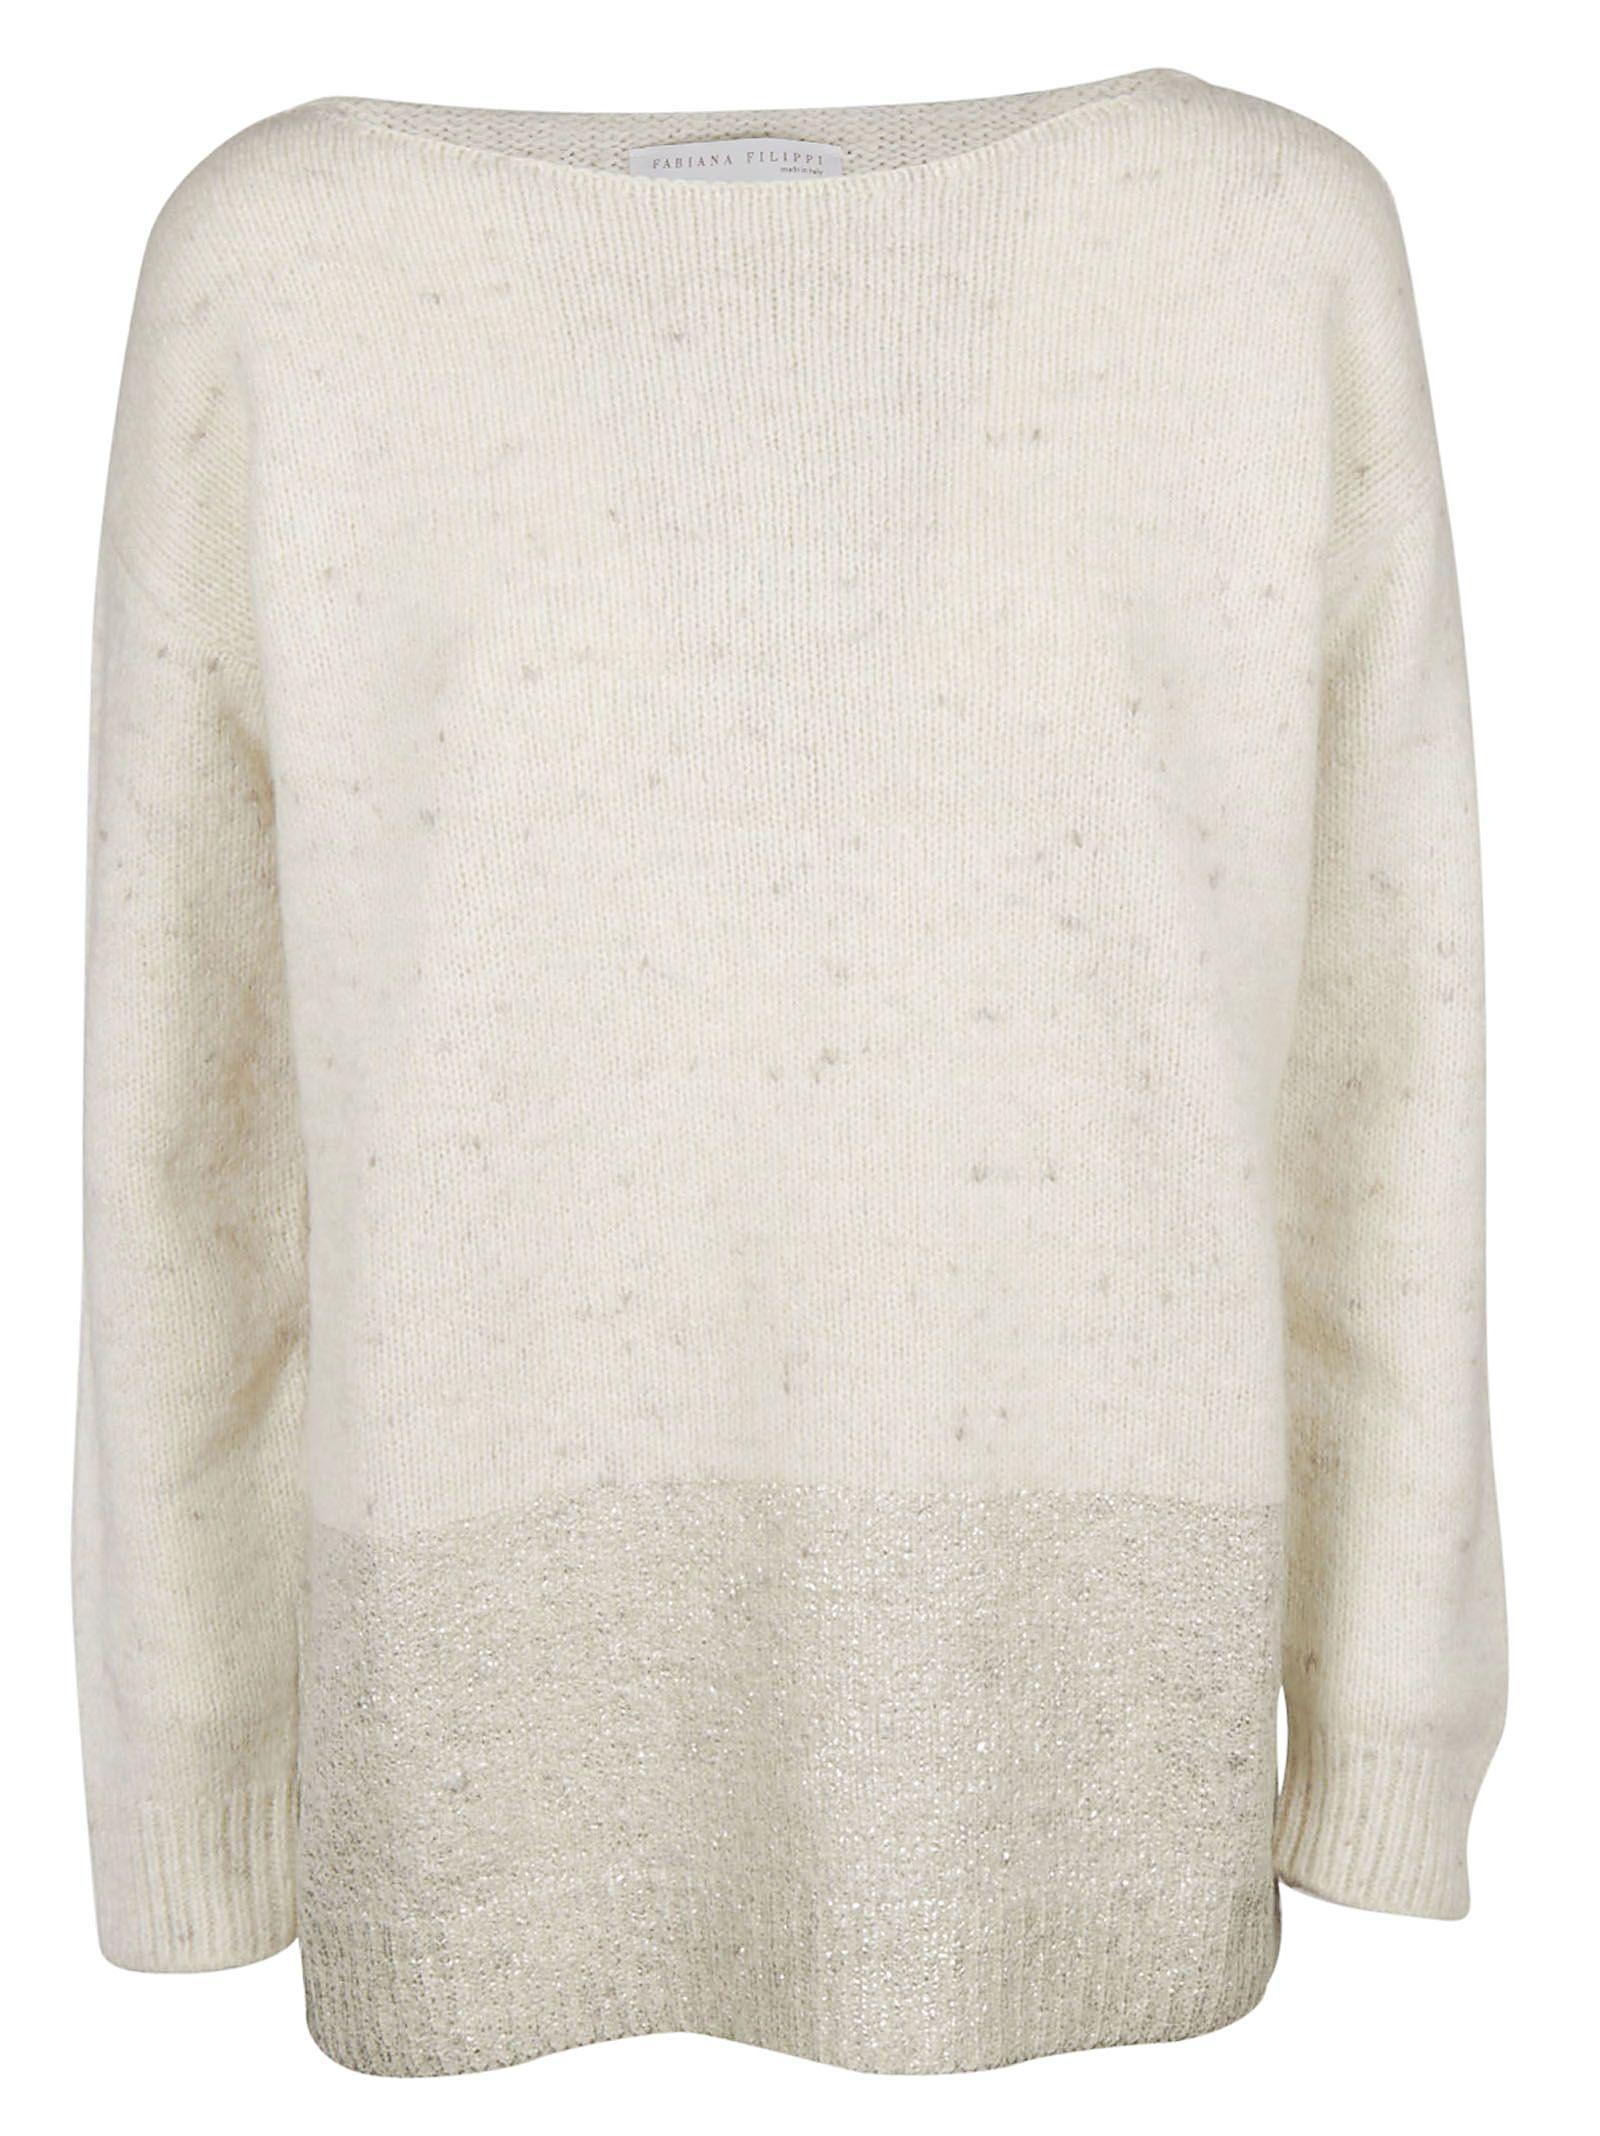 Fabiana Filippi Knitted Sweater In White